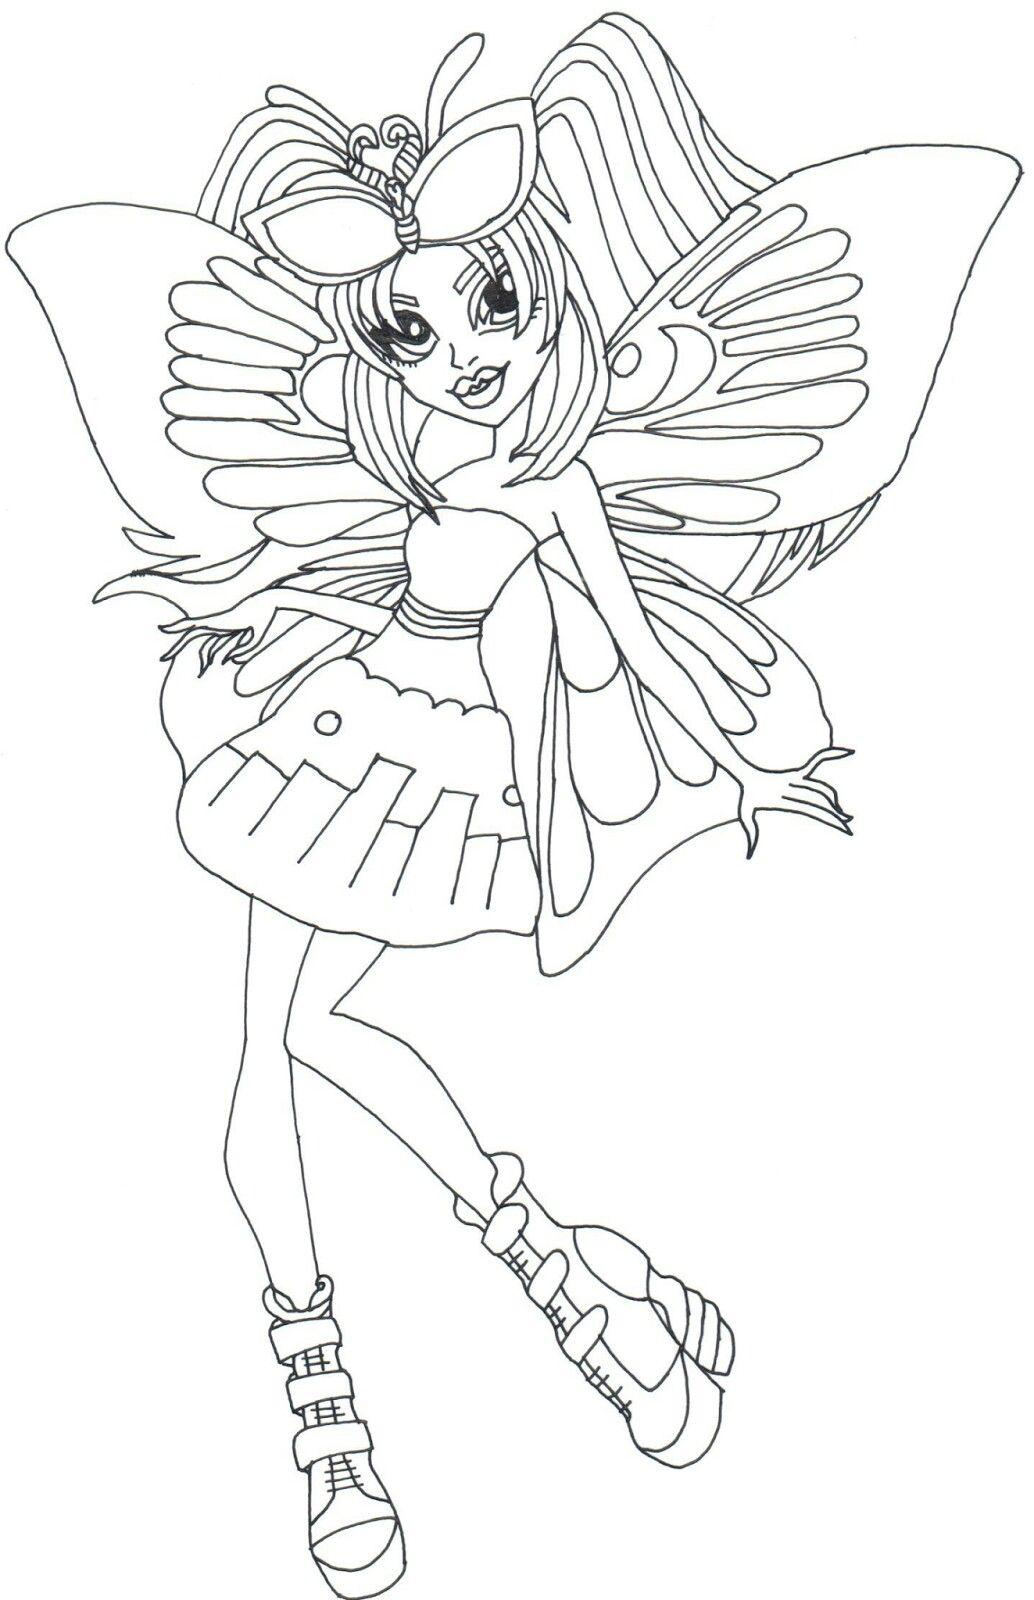 Monster High Luna Mothews Saved From Thebestlaurenmontgomery Tumblr